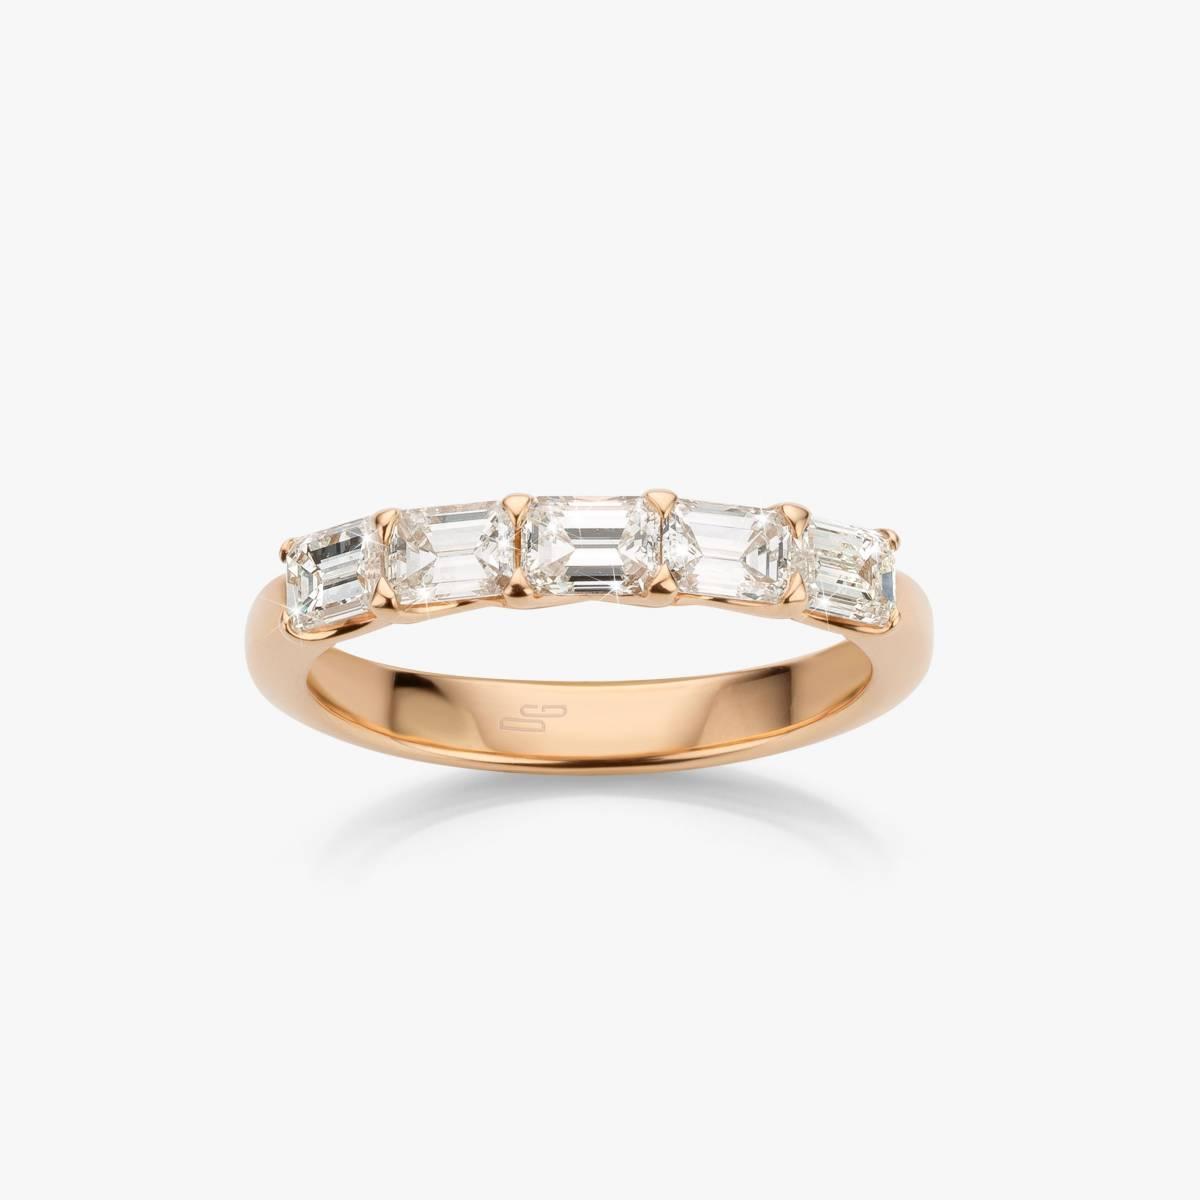 Maison De Greef - Juwelen - Brussel - Bruidsjuwelen - Trouwring - Verlovingsring - House of Weddings - 5